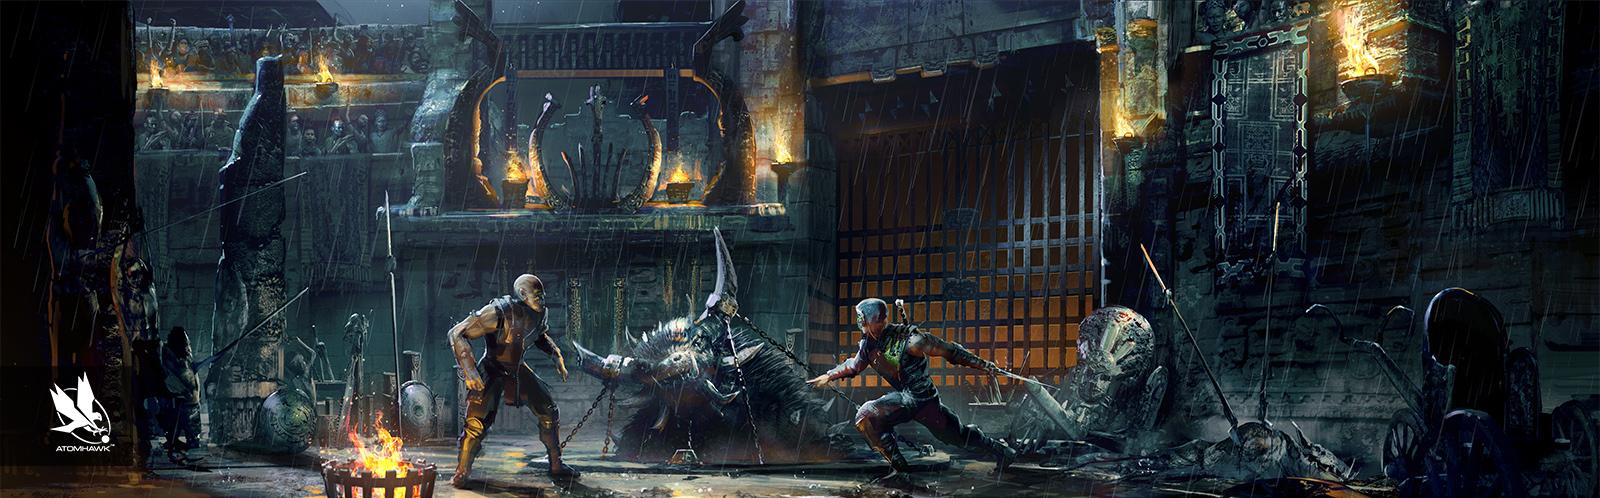 Atomhawk_Warner-Bros-NetherRealm_Mortal-Kombat-11_Concept-Art_Environment-Design_Kotal's-Koliseum_Night.jpg